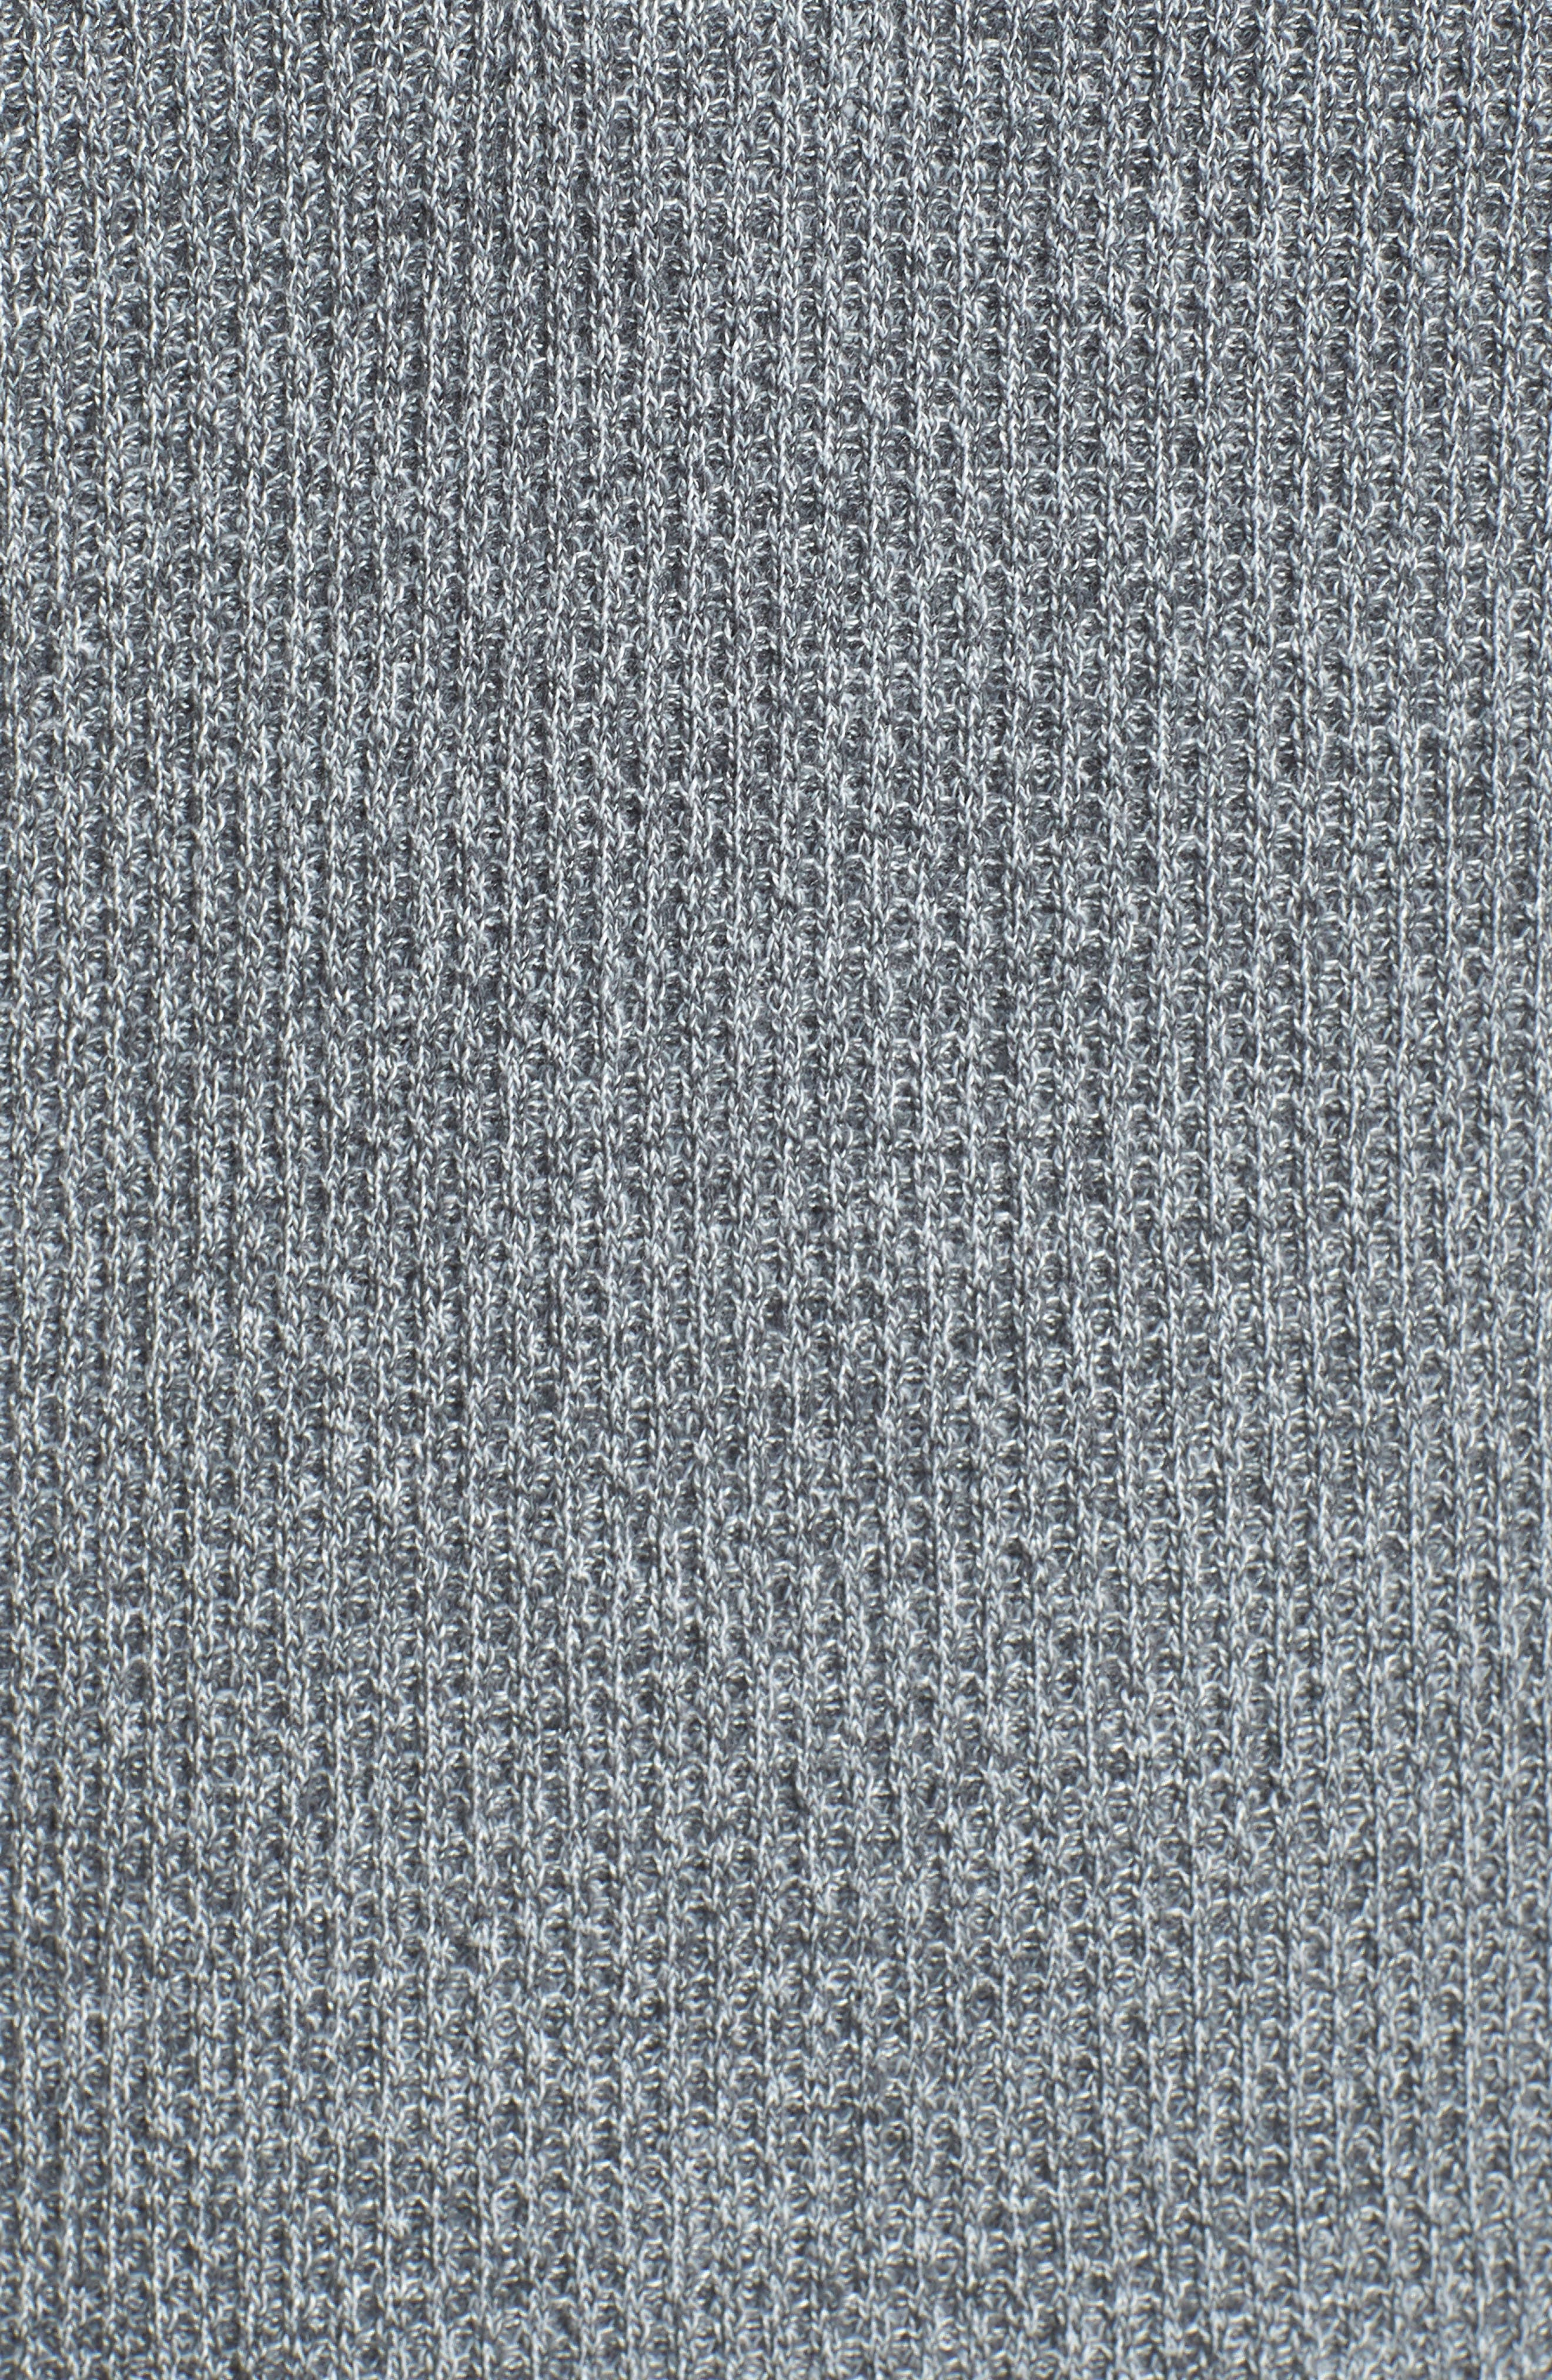 Slim Fit Long Sleeve Henley Shirt,                             Alternate thumbnail 5, color,                             200